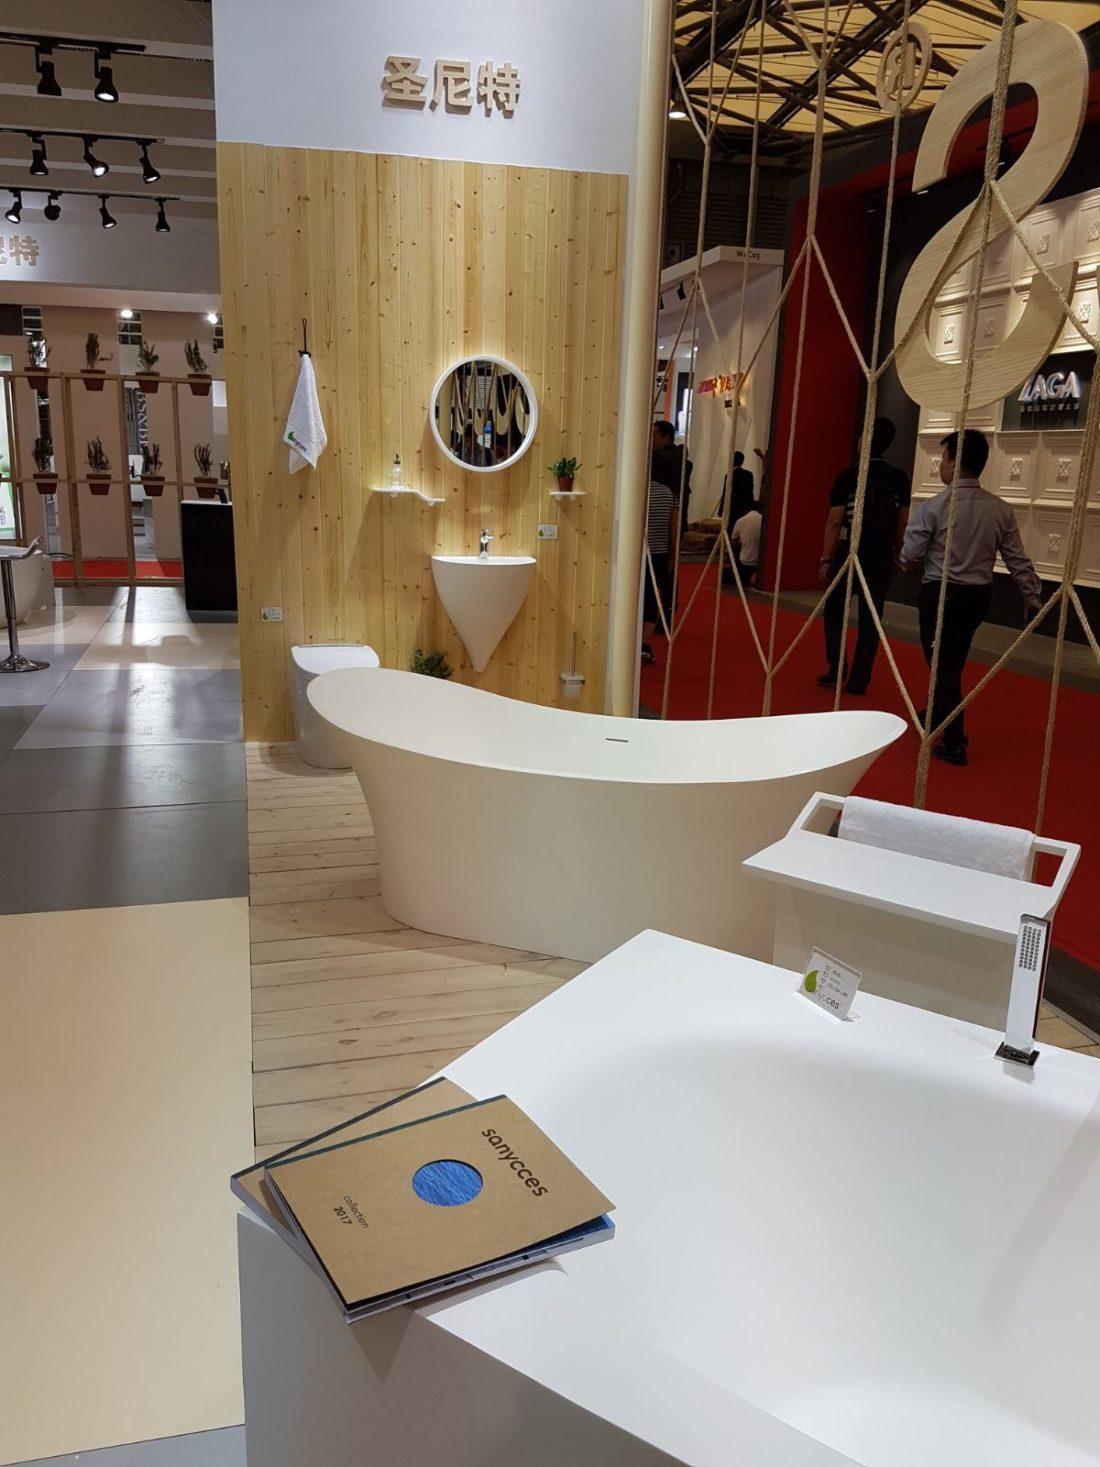 sanycces present au salon kitchen and bath shanghai 2017 sanycces. Black Bedroom Furniture Sets. Home Design Ideas